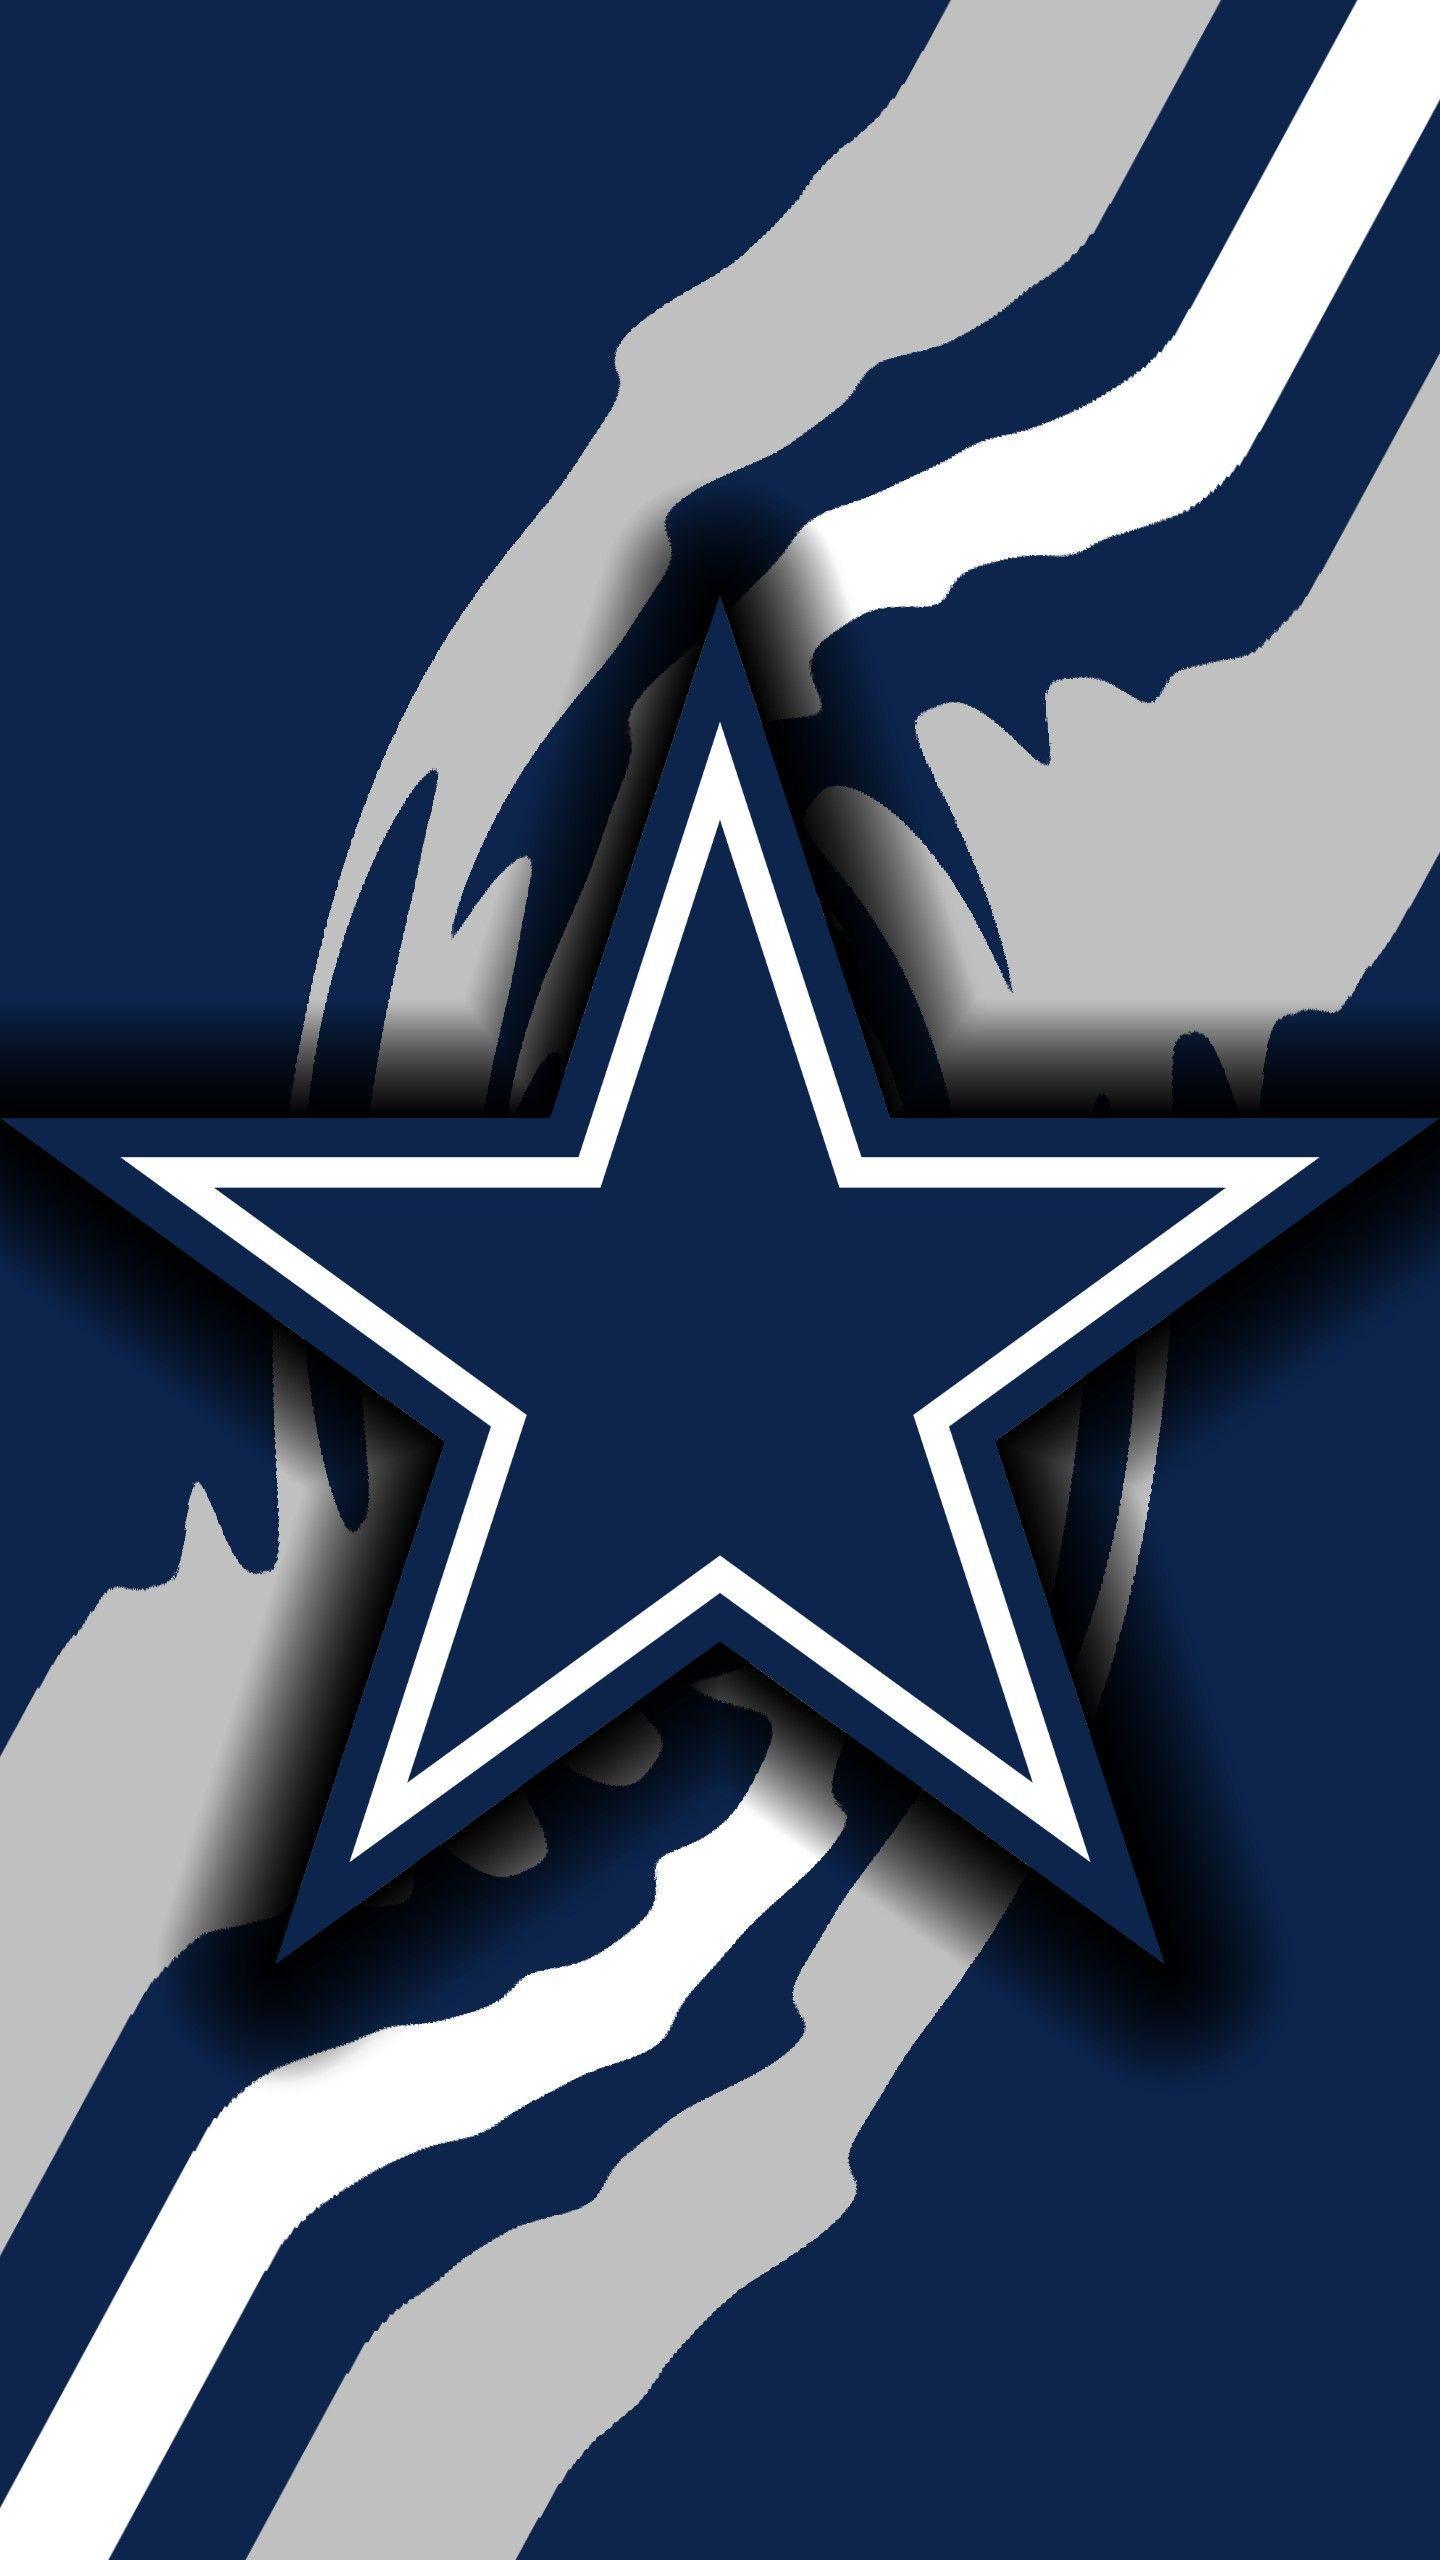 Dallas Cowboys 2017 Wallpapers - Wallpaper Cave